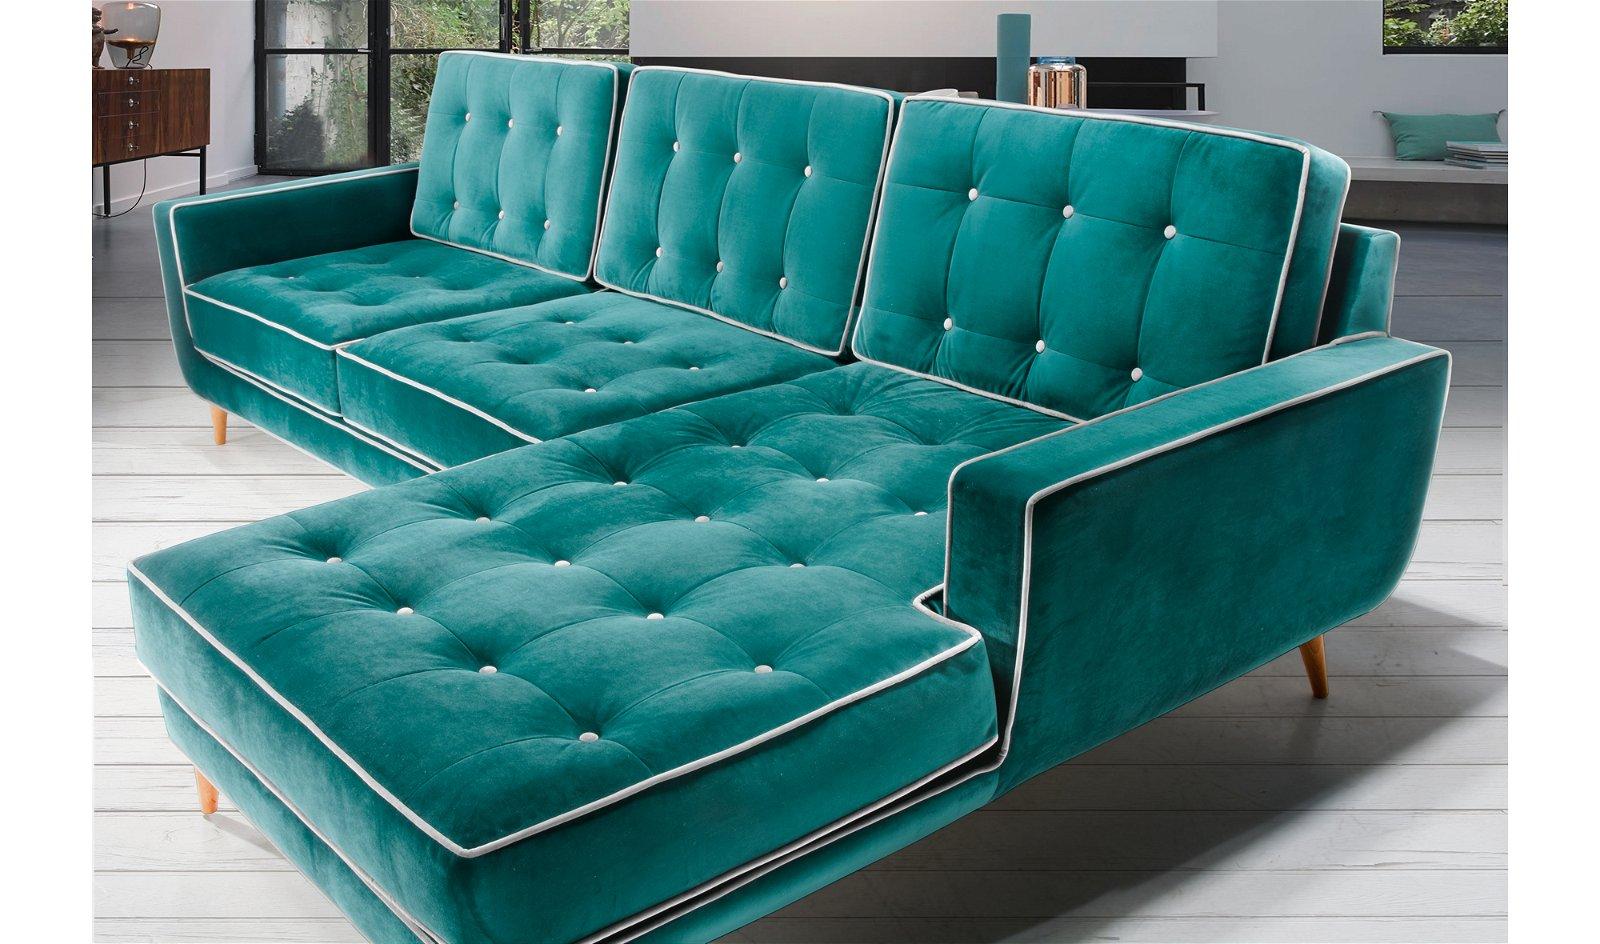 Sofá con chaise longue retro Sterling Cooper